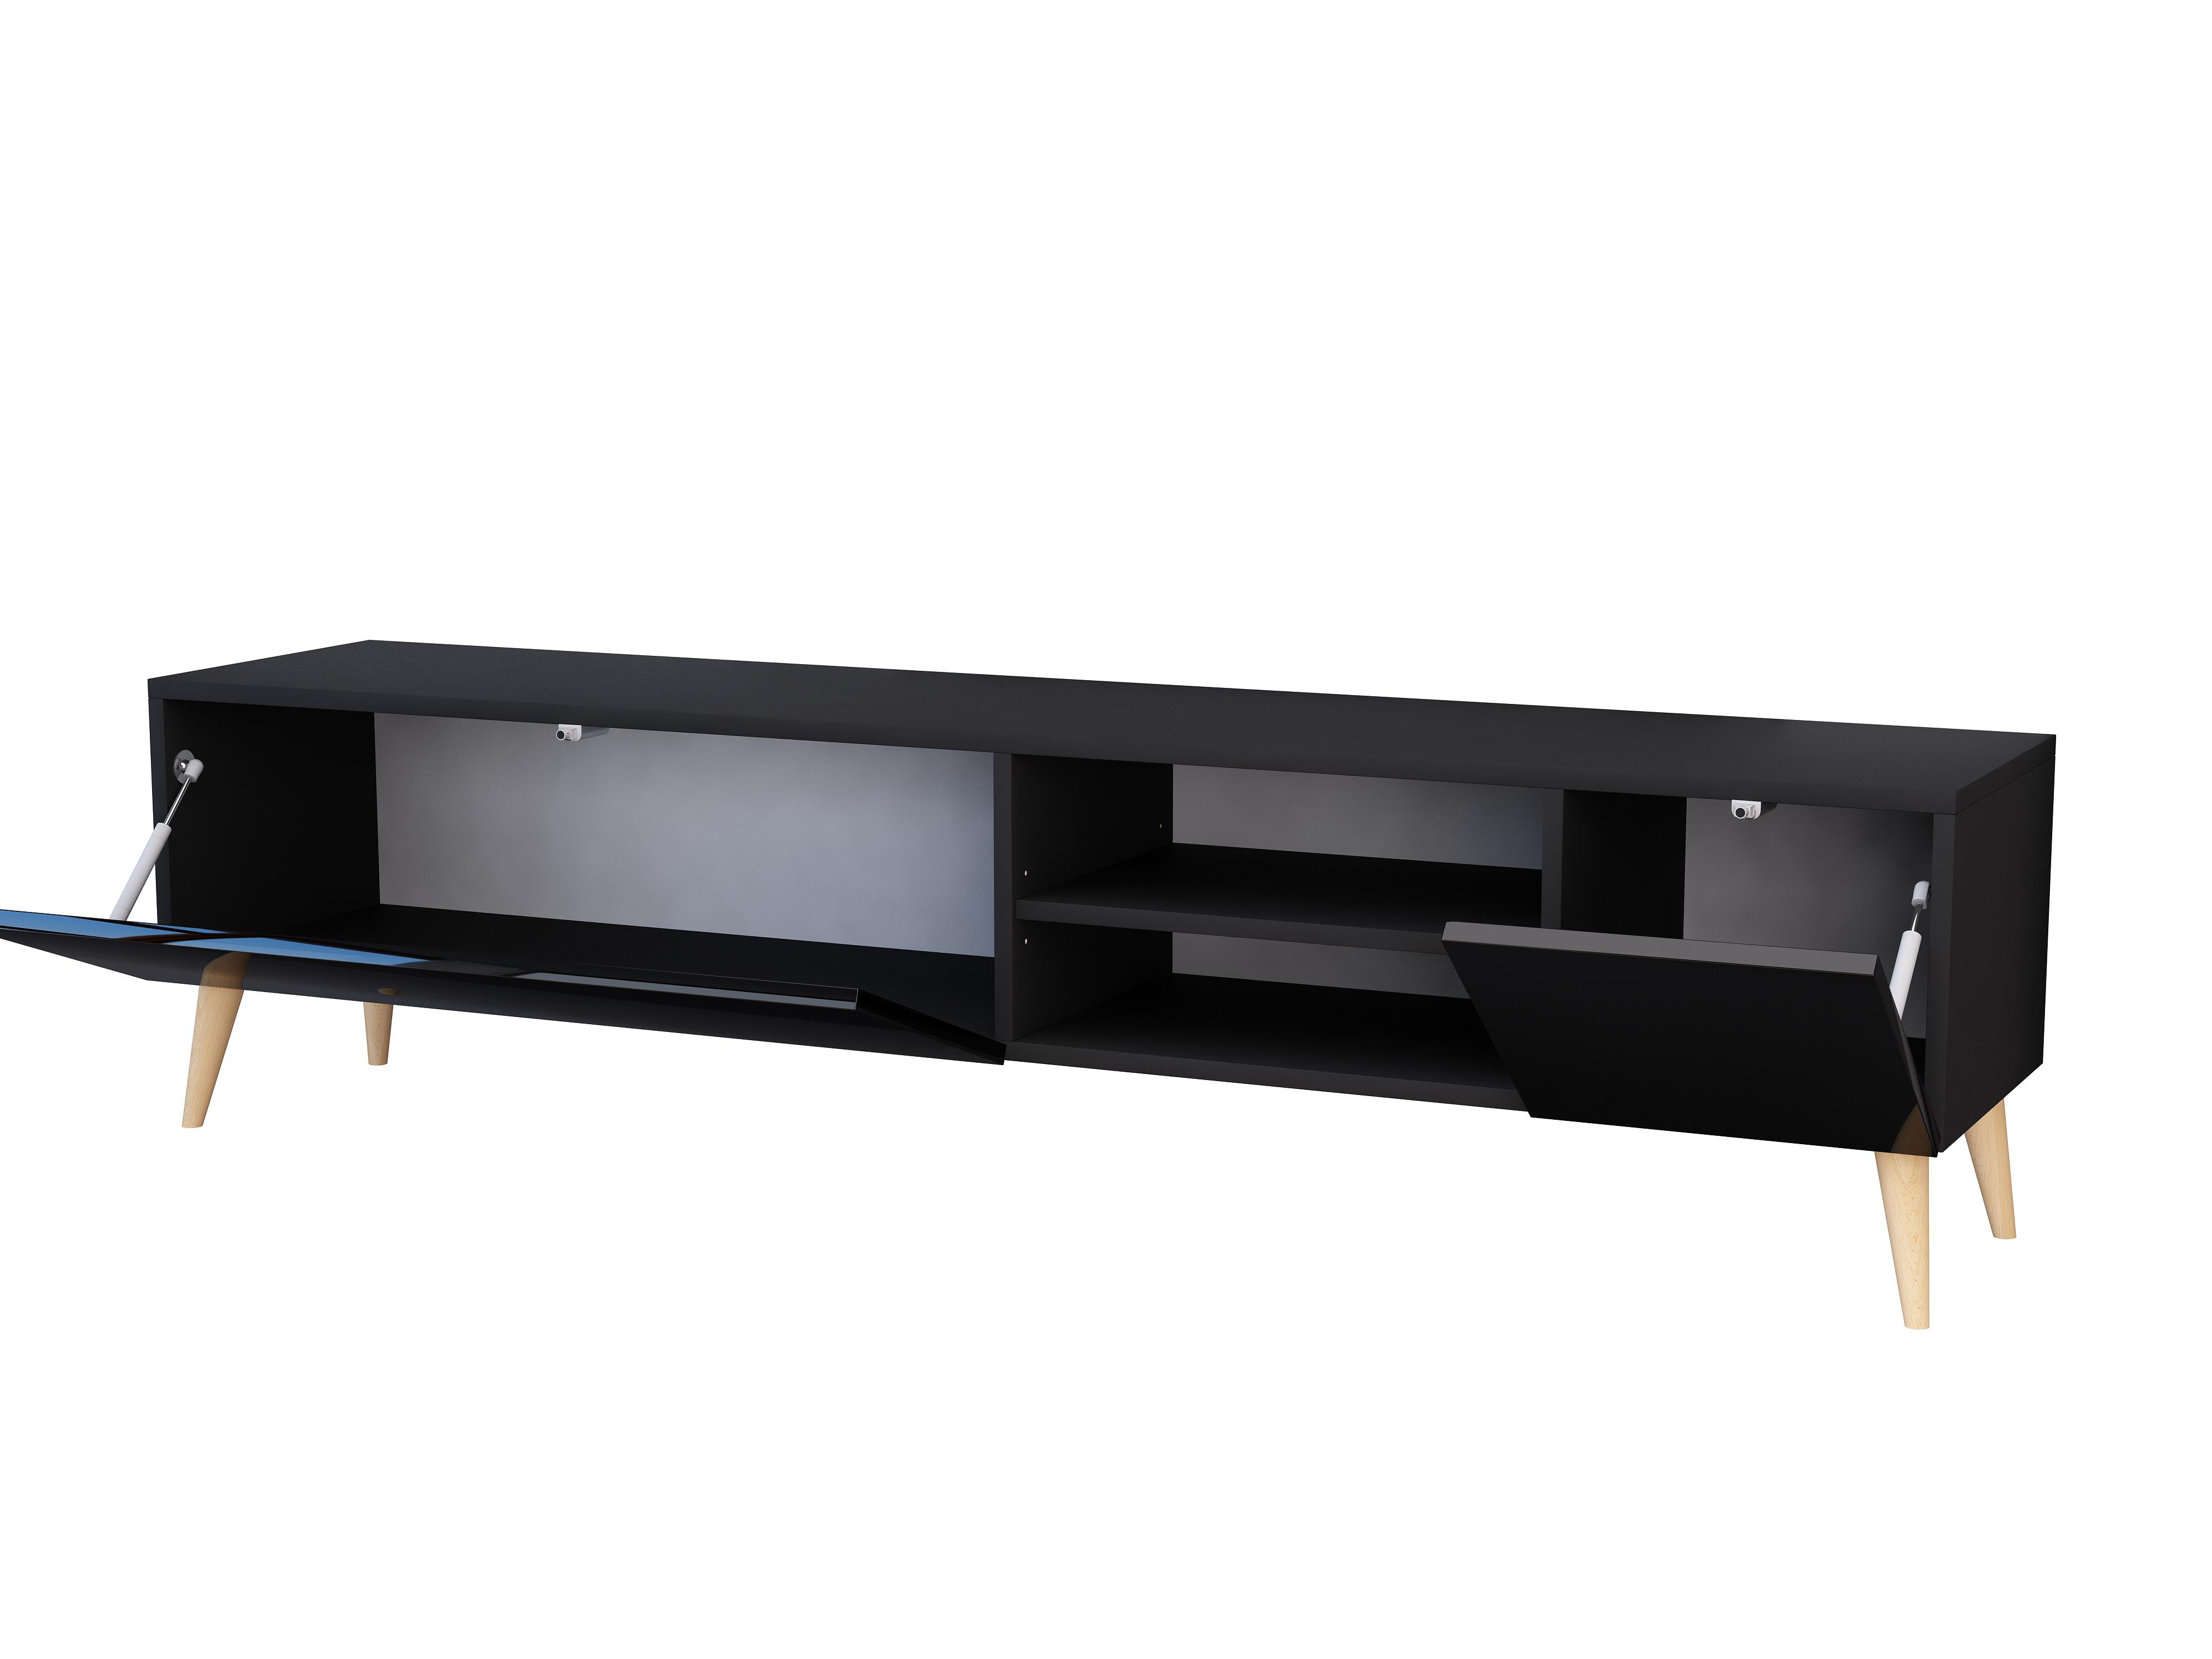 Szafka rtv Scandi Galicja2, 180cm, czarna